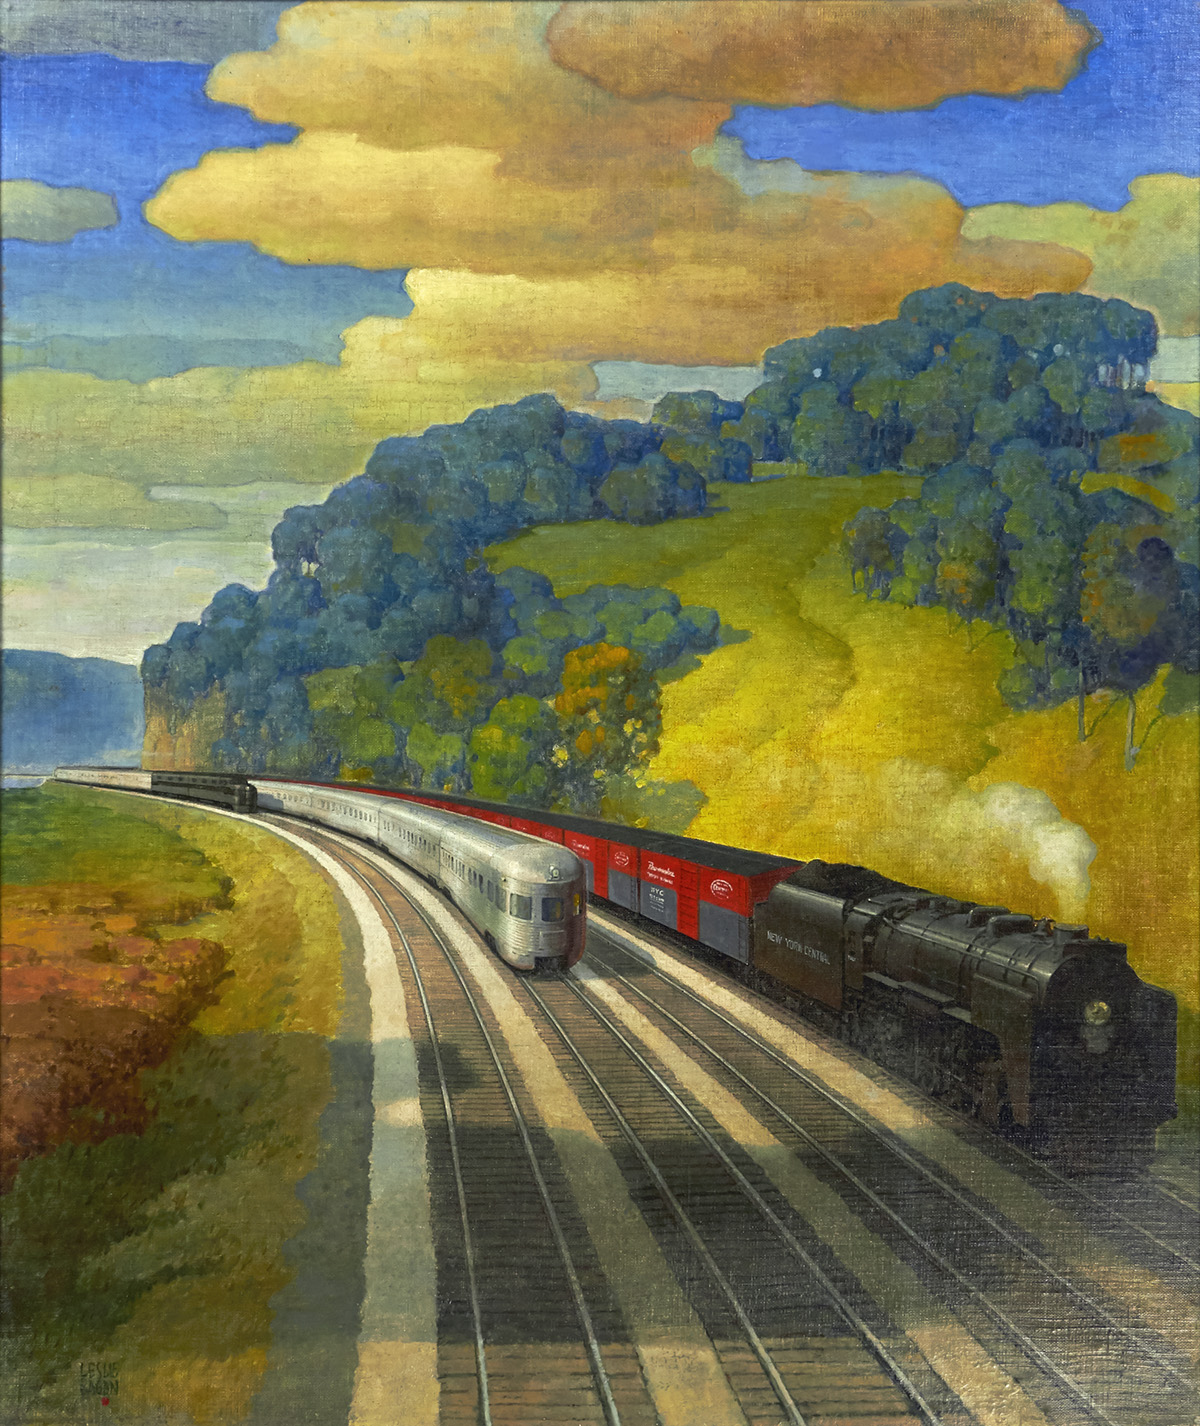 LESLIE-RAGAN-New-York-Central-System--[RAILROADS--TRAINS]